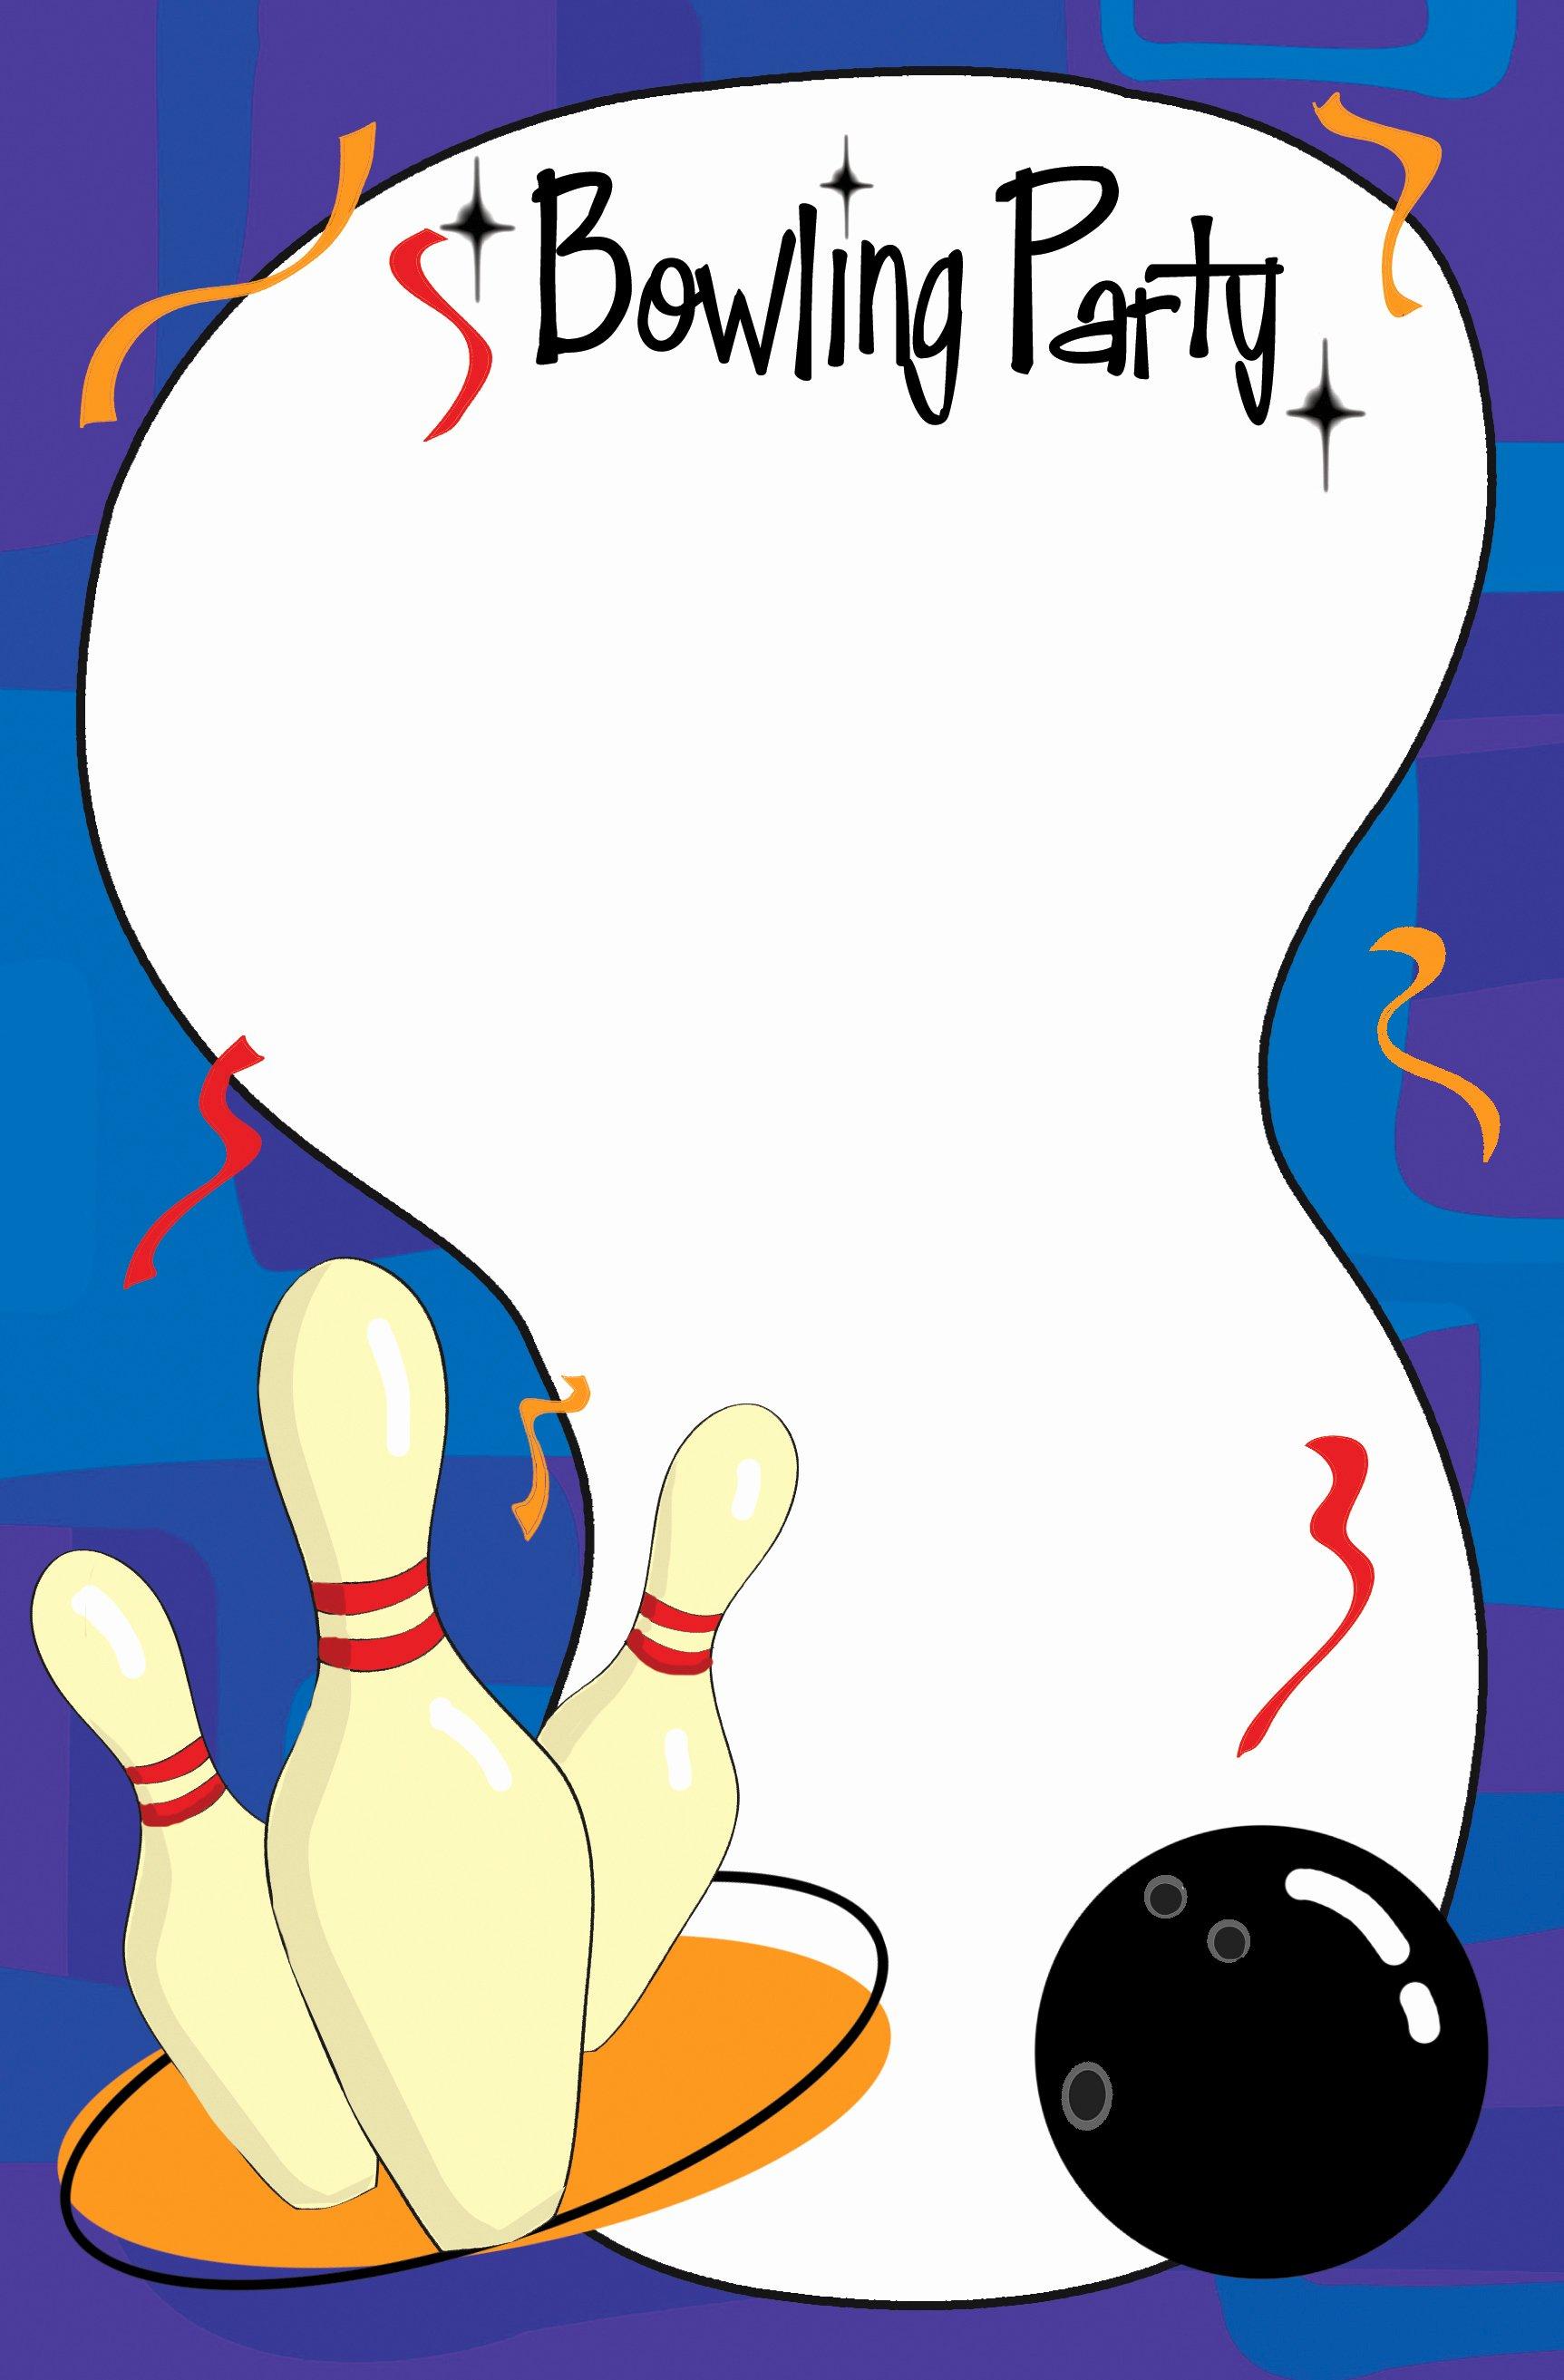 Bowling Invitation Template Free New Bowling Flyer Template Free Portablegasgrillweber